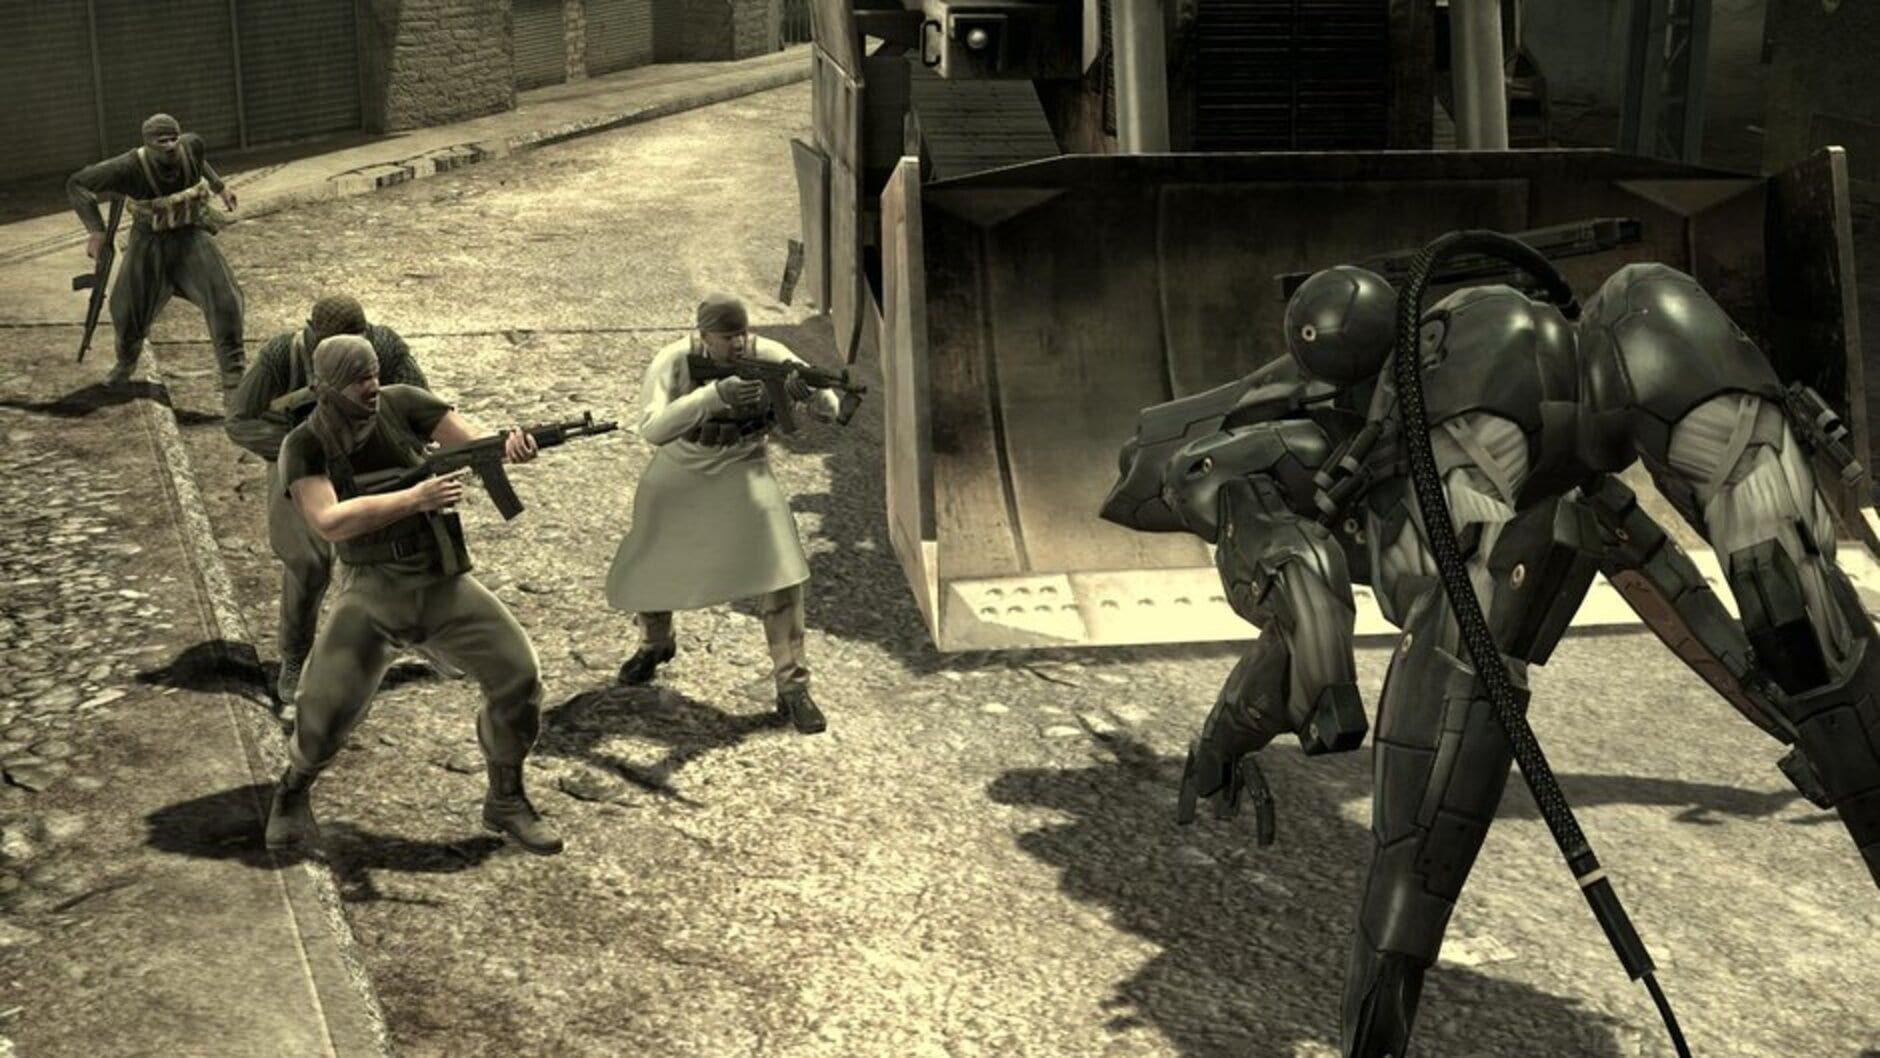 Metal Gear Solid 4: Guns of the Patriots - 3